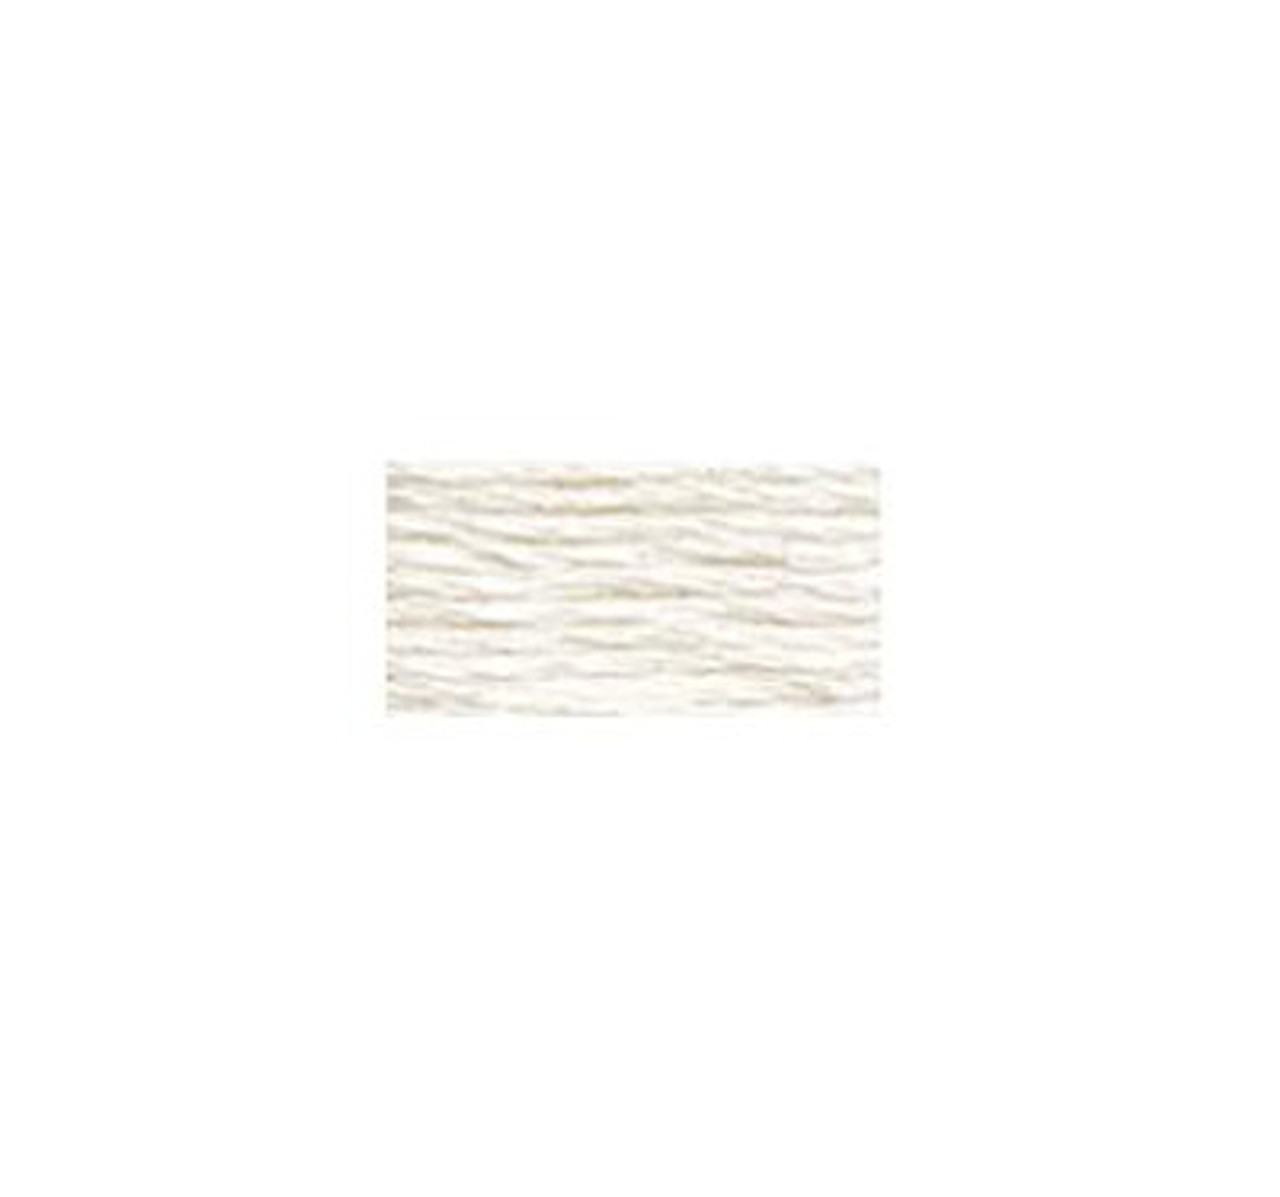 Box of DMC # BLANC White Floss / Thread (12 Skeins)